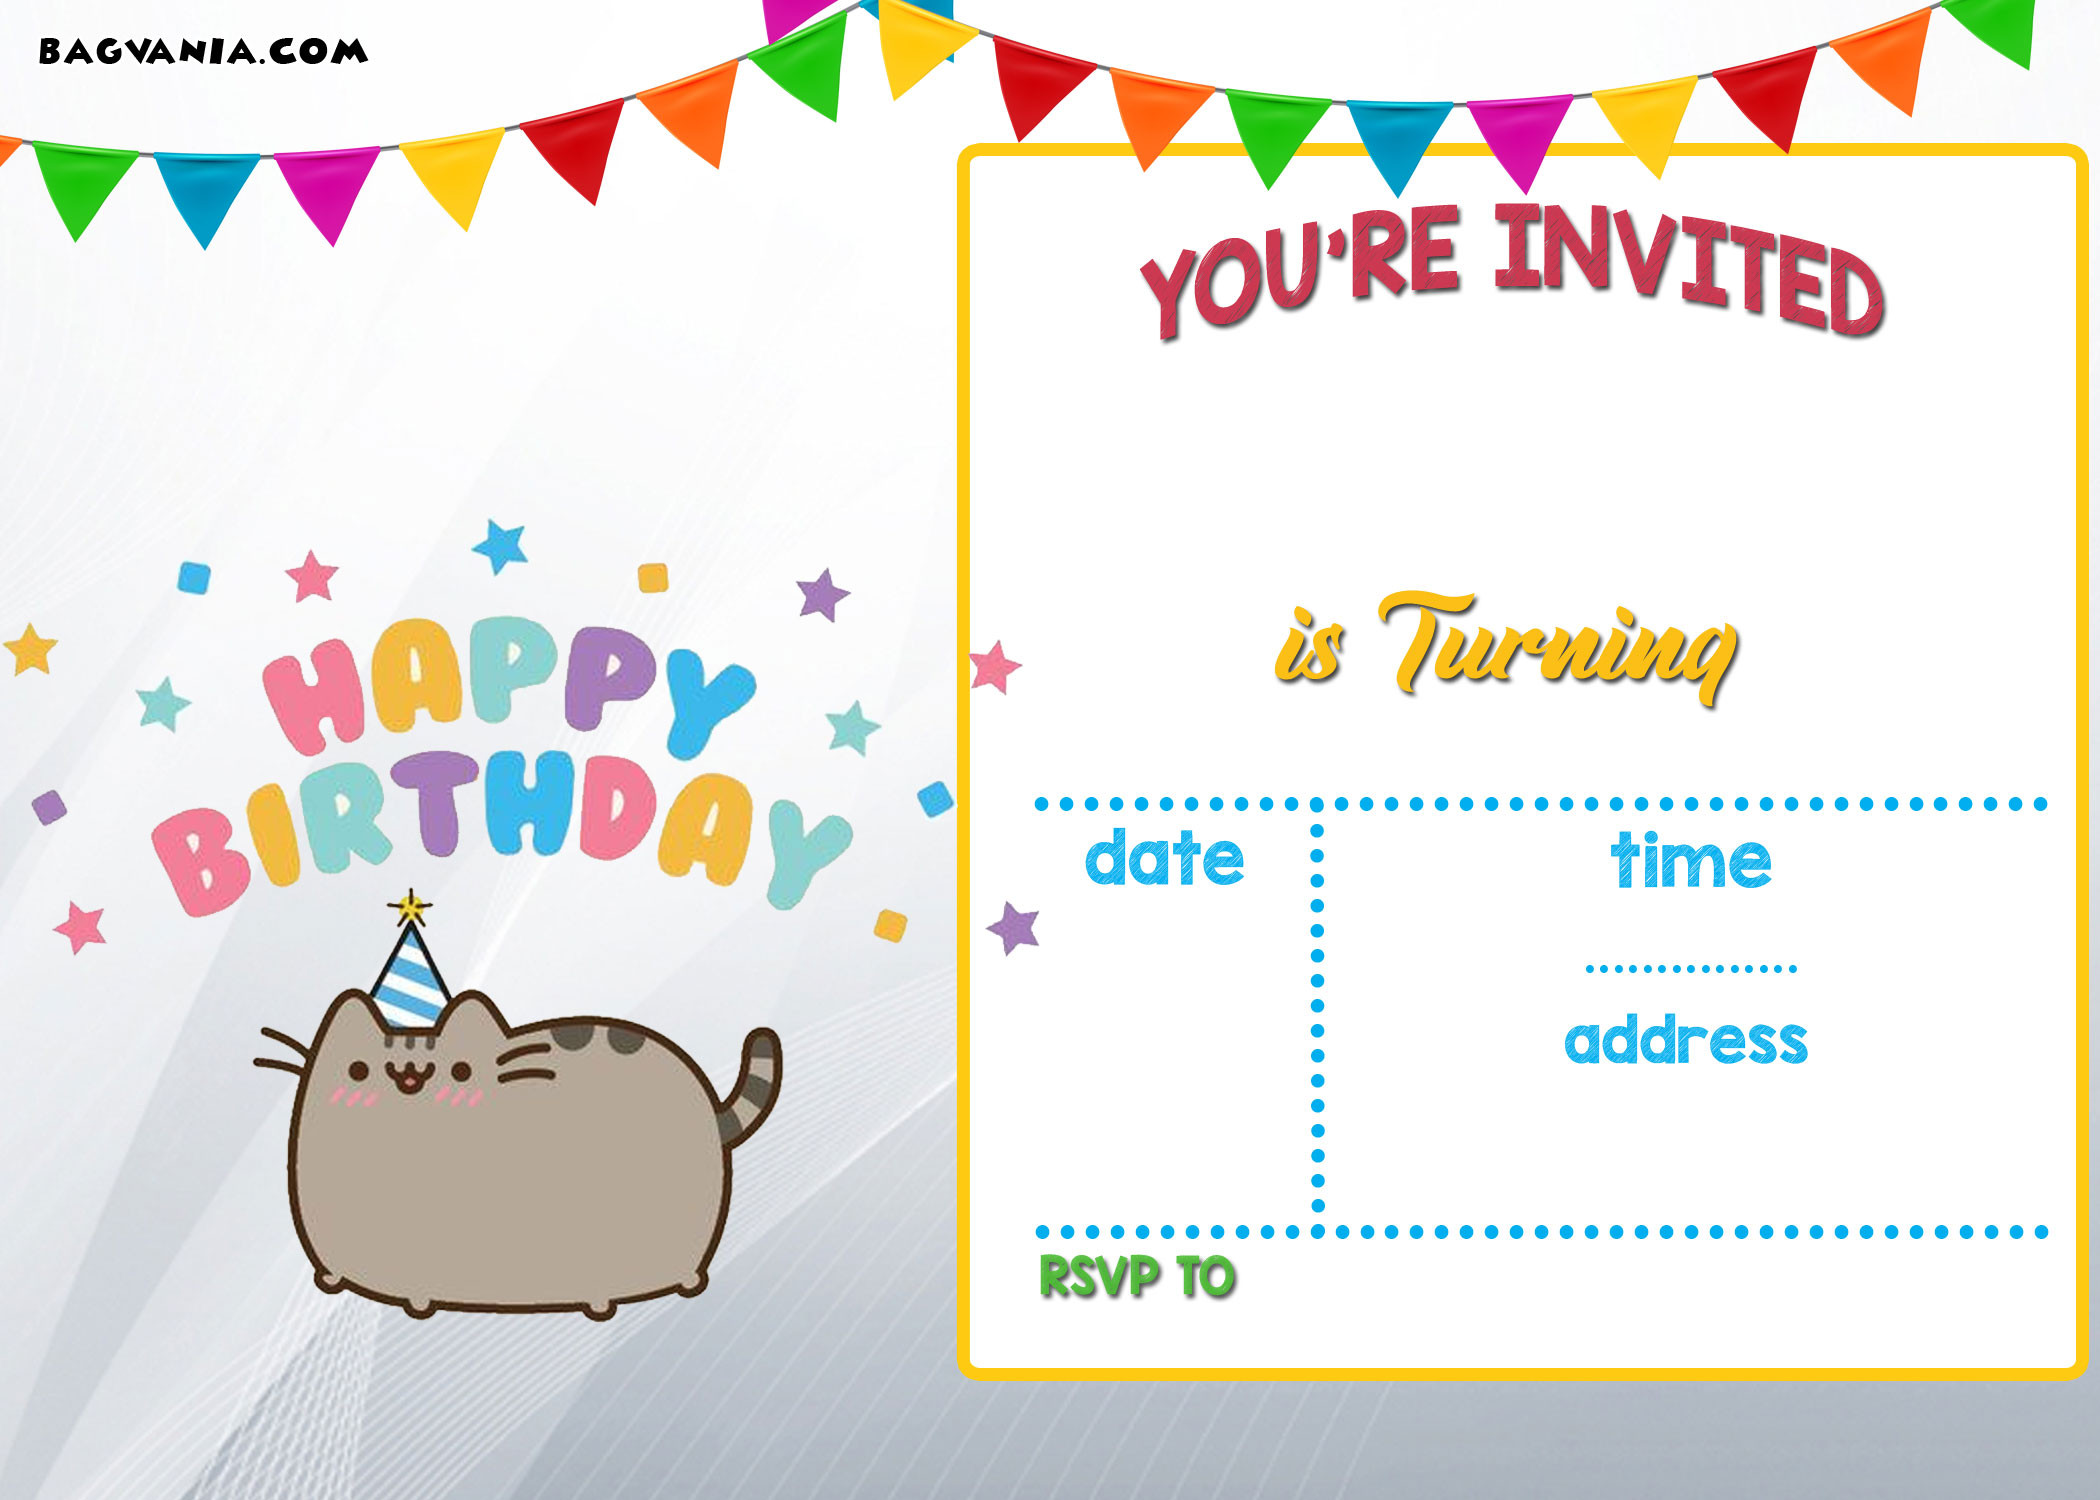 Best ideas about Free Kids Birthday Invitations . Save or Pin Free Printable Kids Birthday Invitations – Bagvania FREE Now.